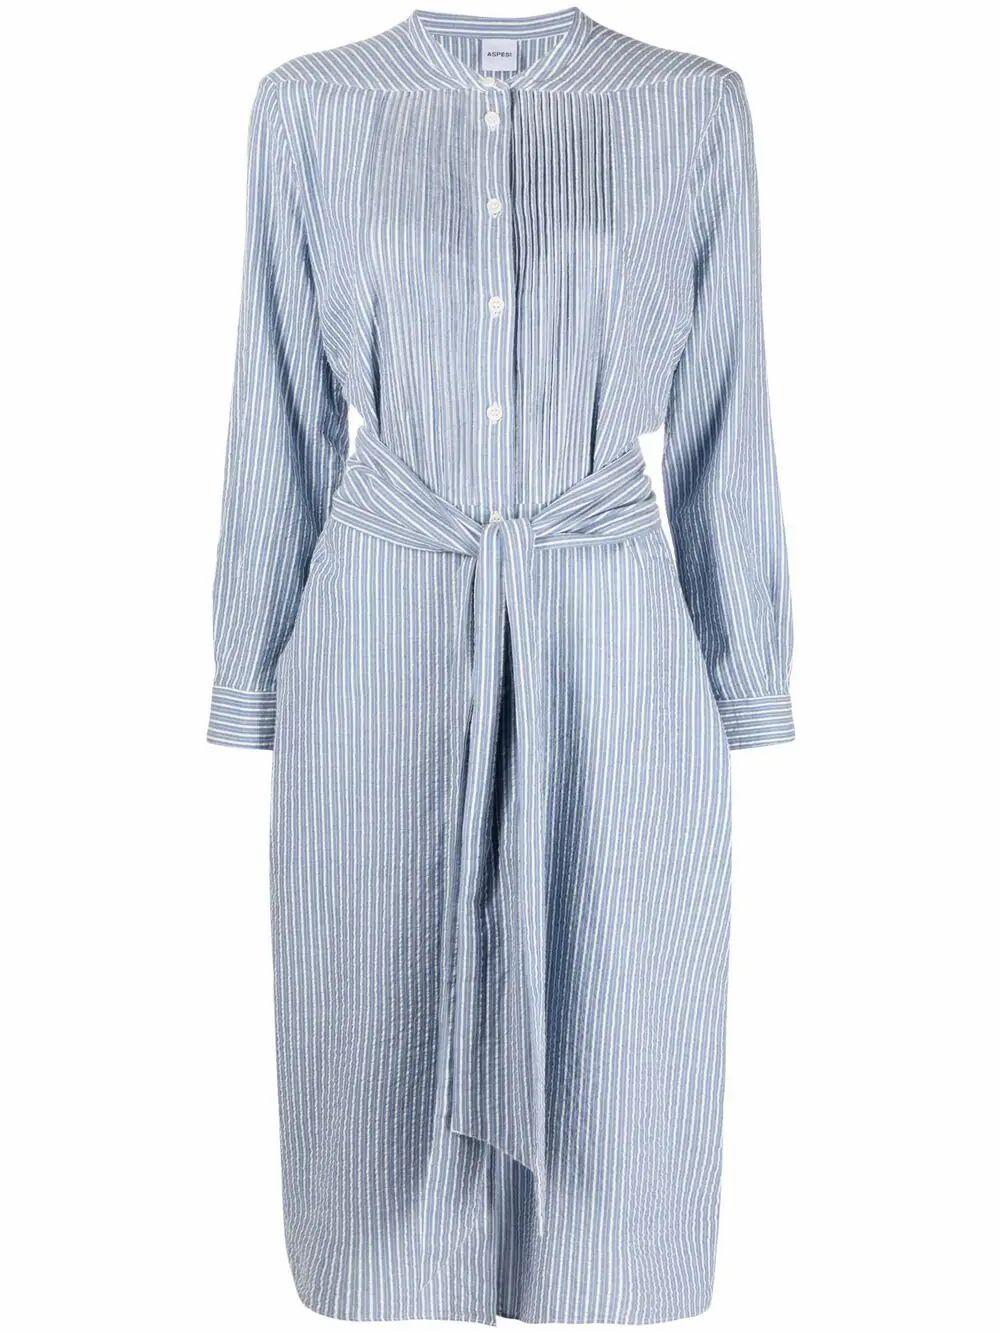 Aspesi ASPESI WOMEN'S BLUE COTTON DRESS